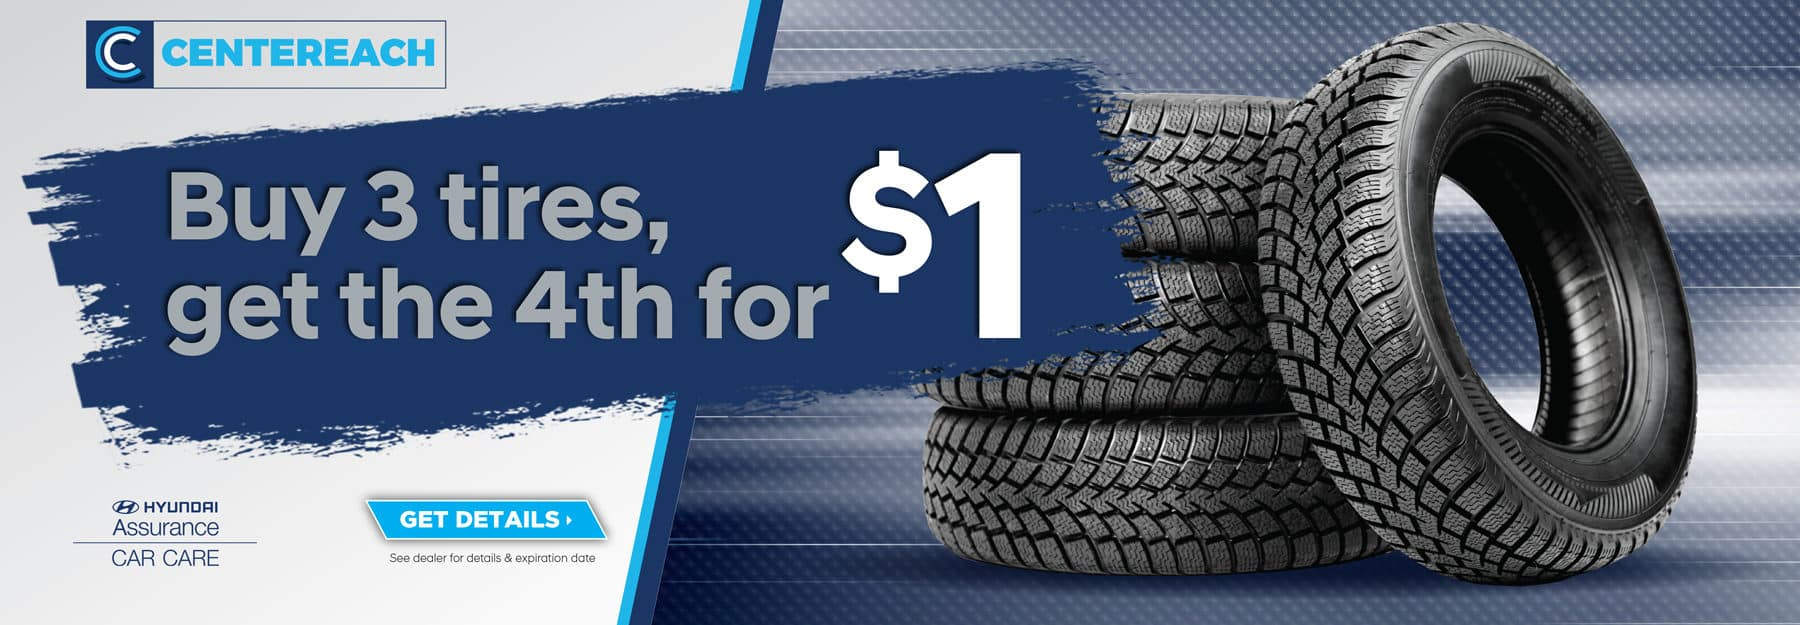 2020.12.24-Centereach-Hyundai-Tire-Special-HP-WEB-2-S50213cr